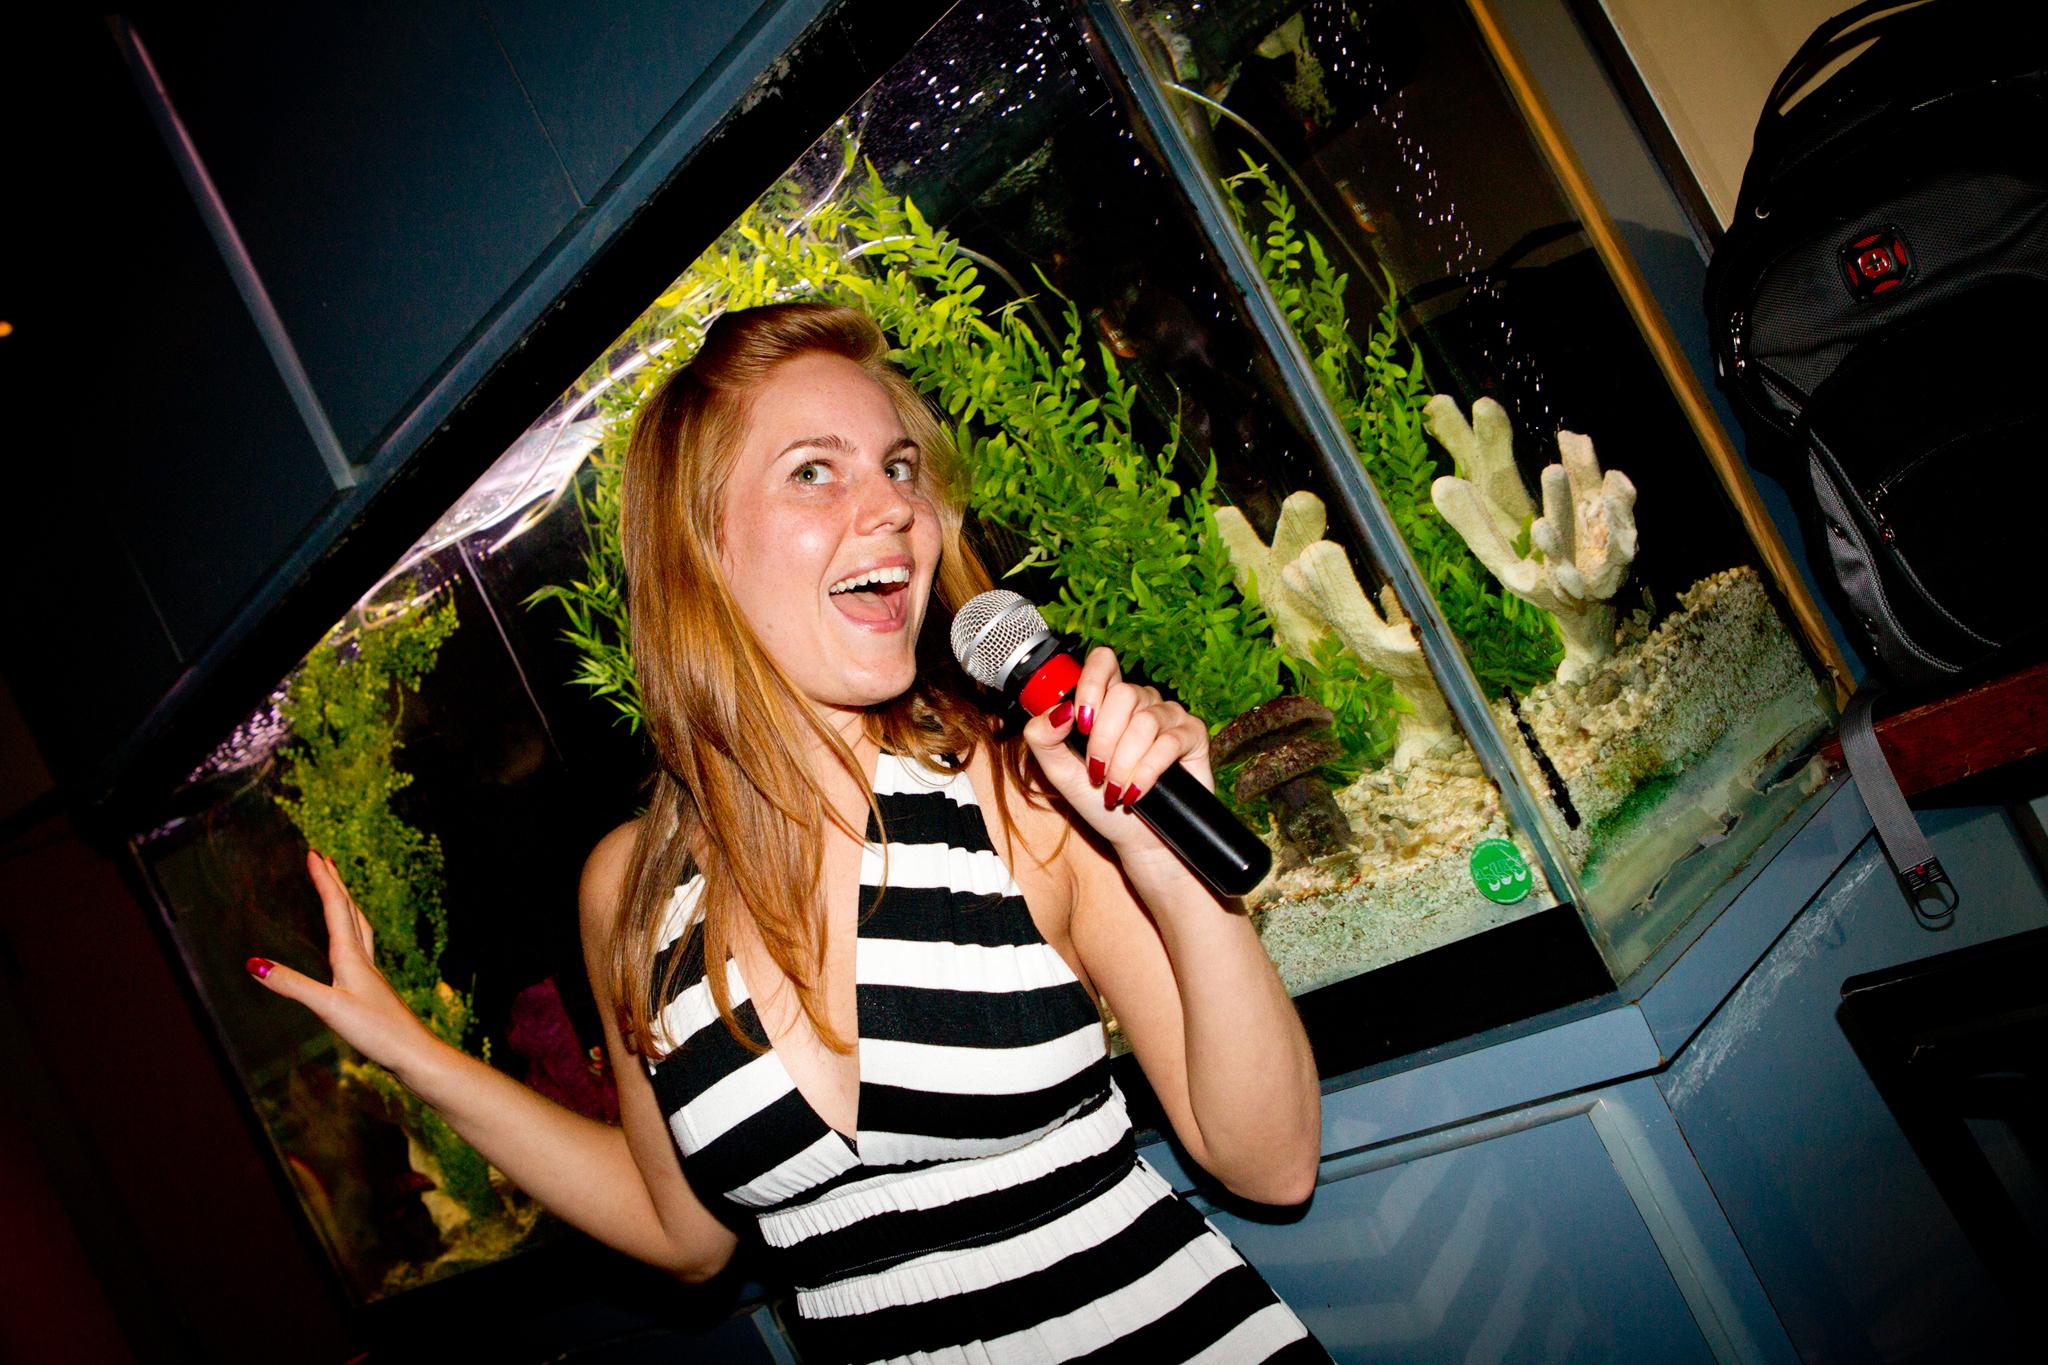 The best karaoke bars in New York City